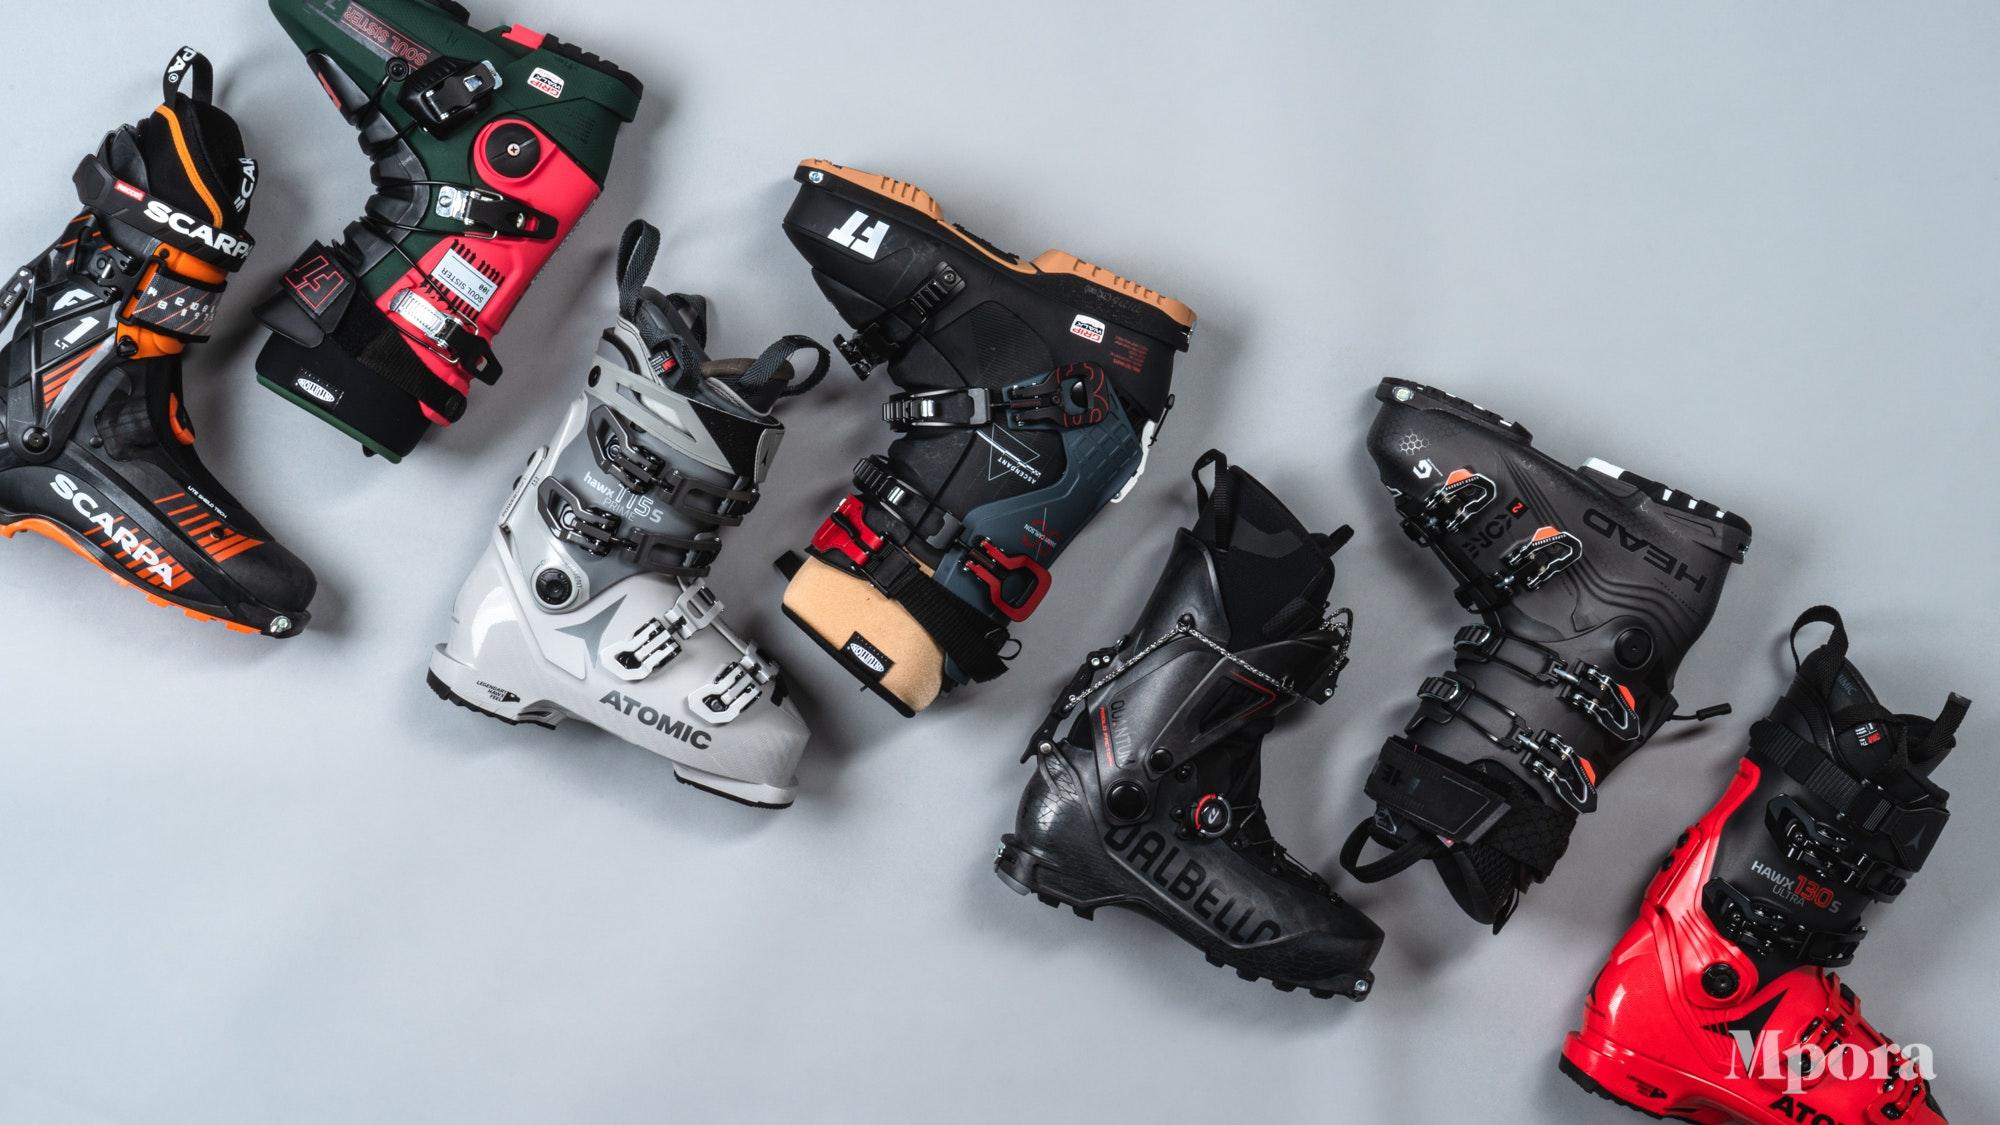 mpora-ski-100-boots-2020-21